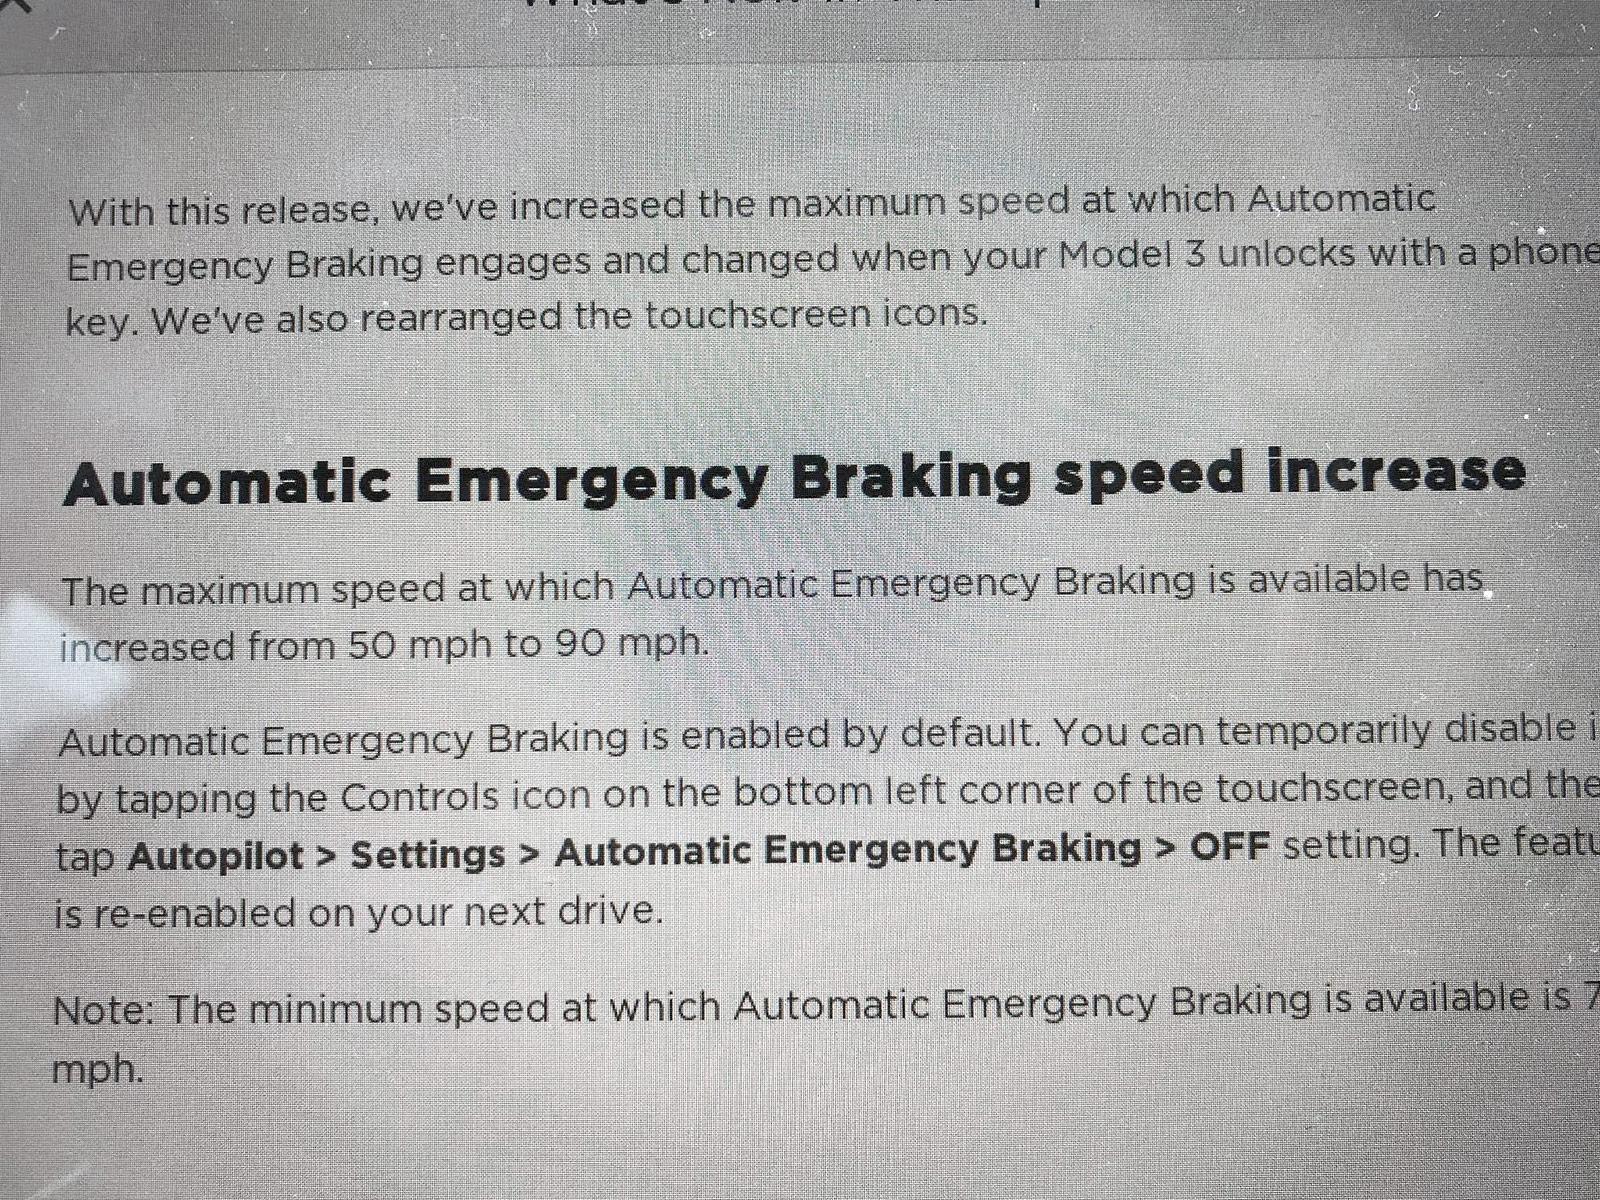 Tesla Model 3 - Automatic Emergency Braking Increased to 90 mph